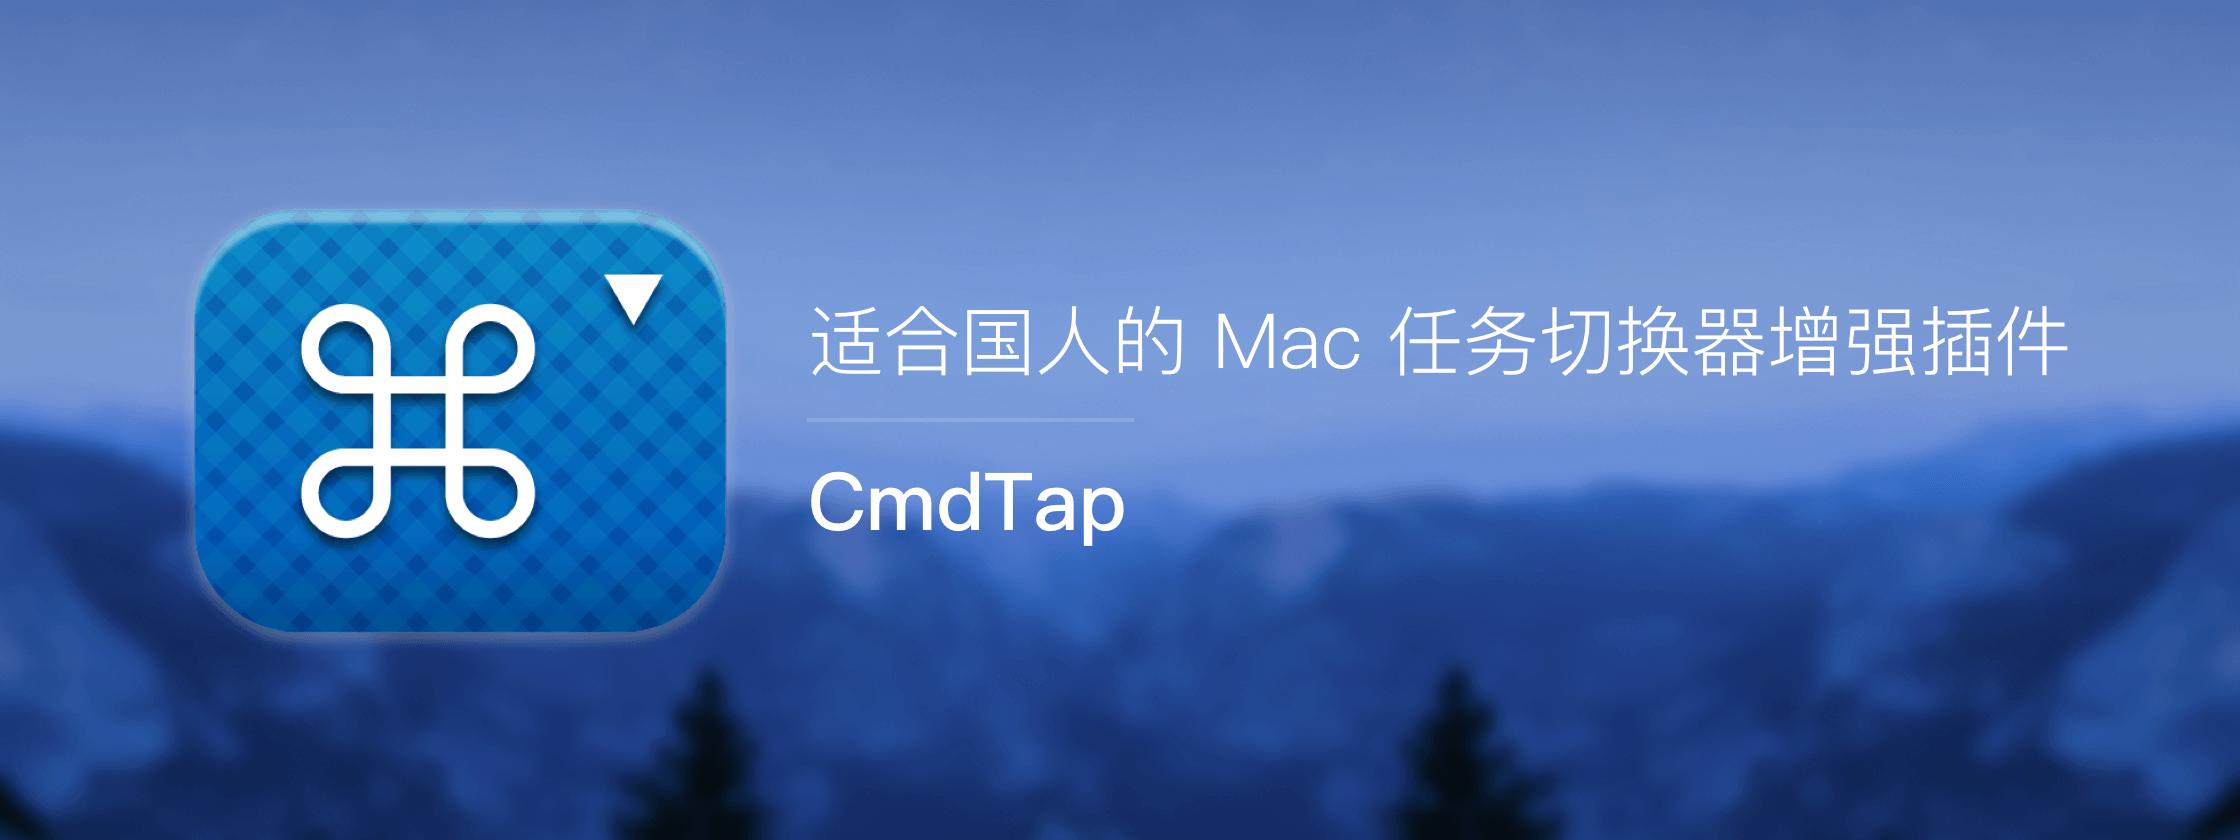 CmdTap – 适合国人的 Mac 任务切换器增强插件